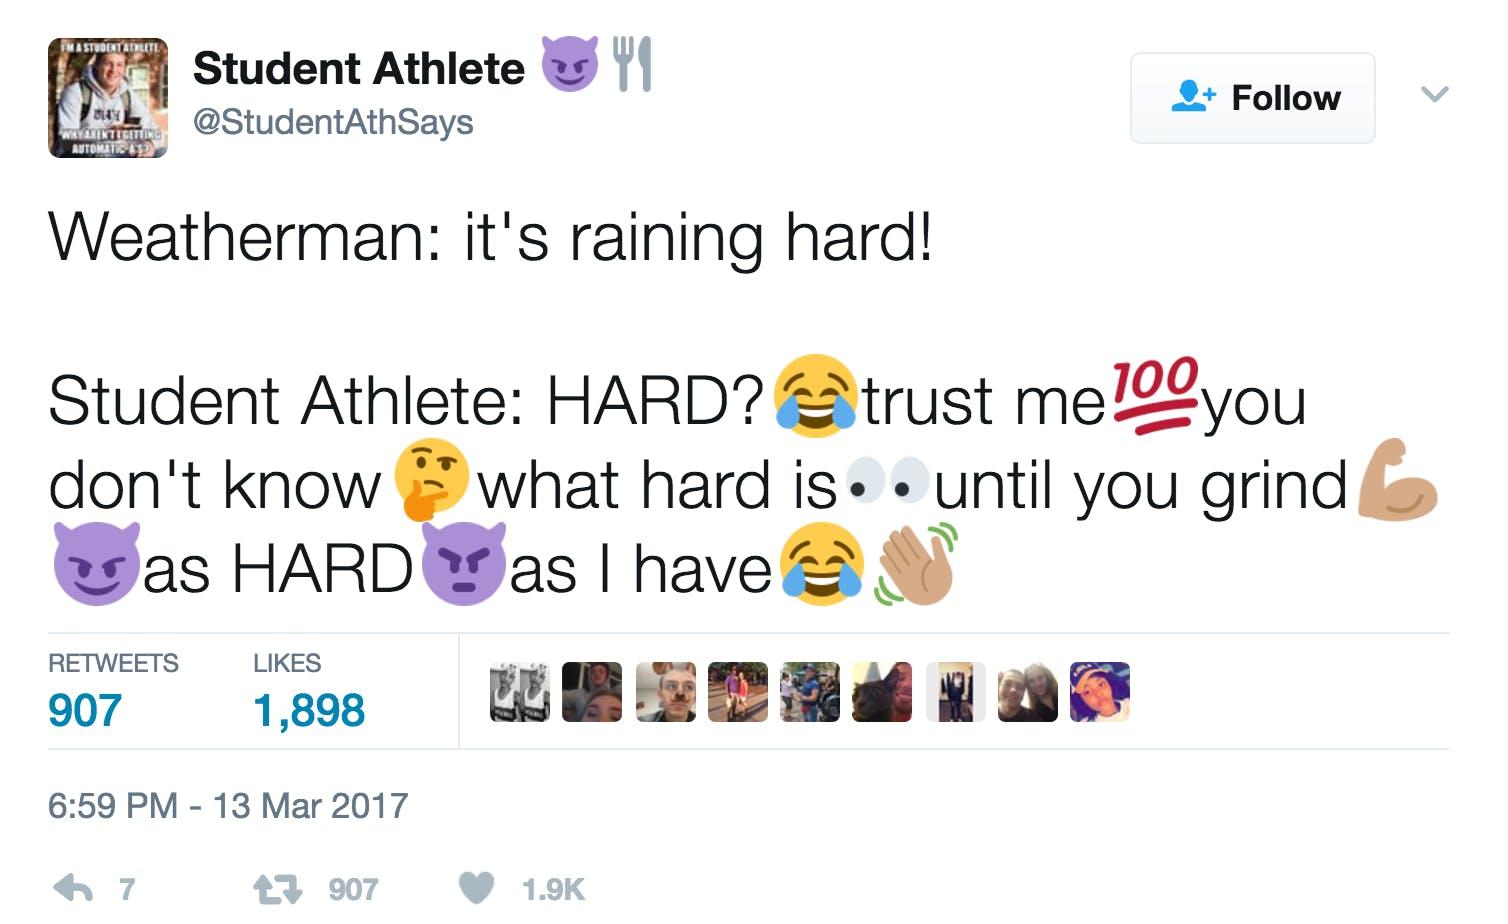 Best memes 2017 : Student athlete